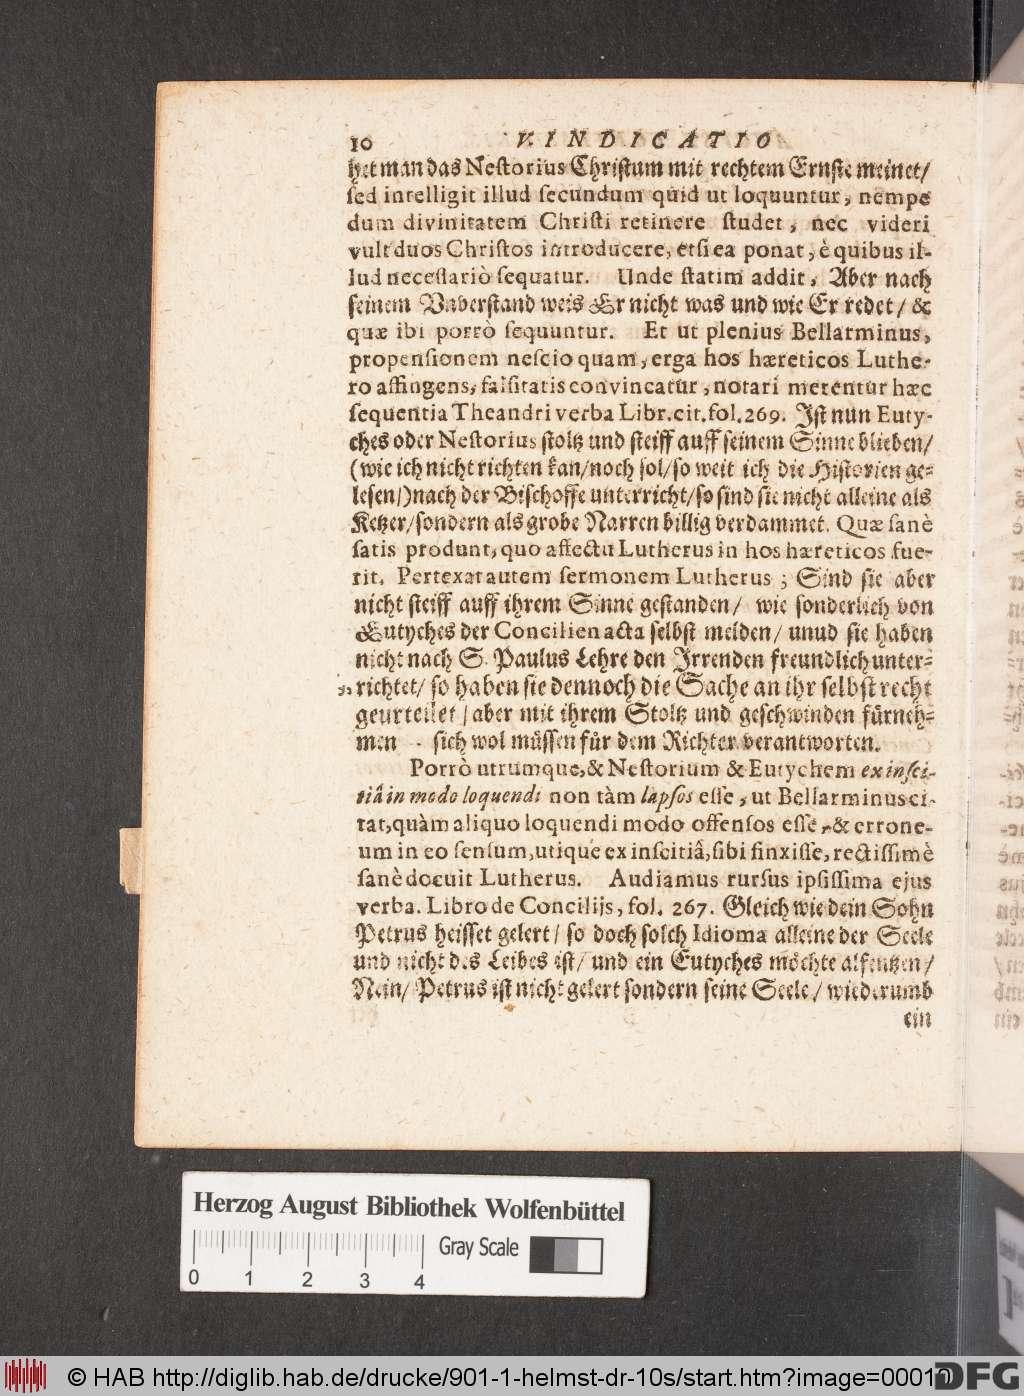 http://diglib.hab.de/drucke/901-1-helmst-dr-10s/00010.jpg